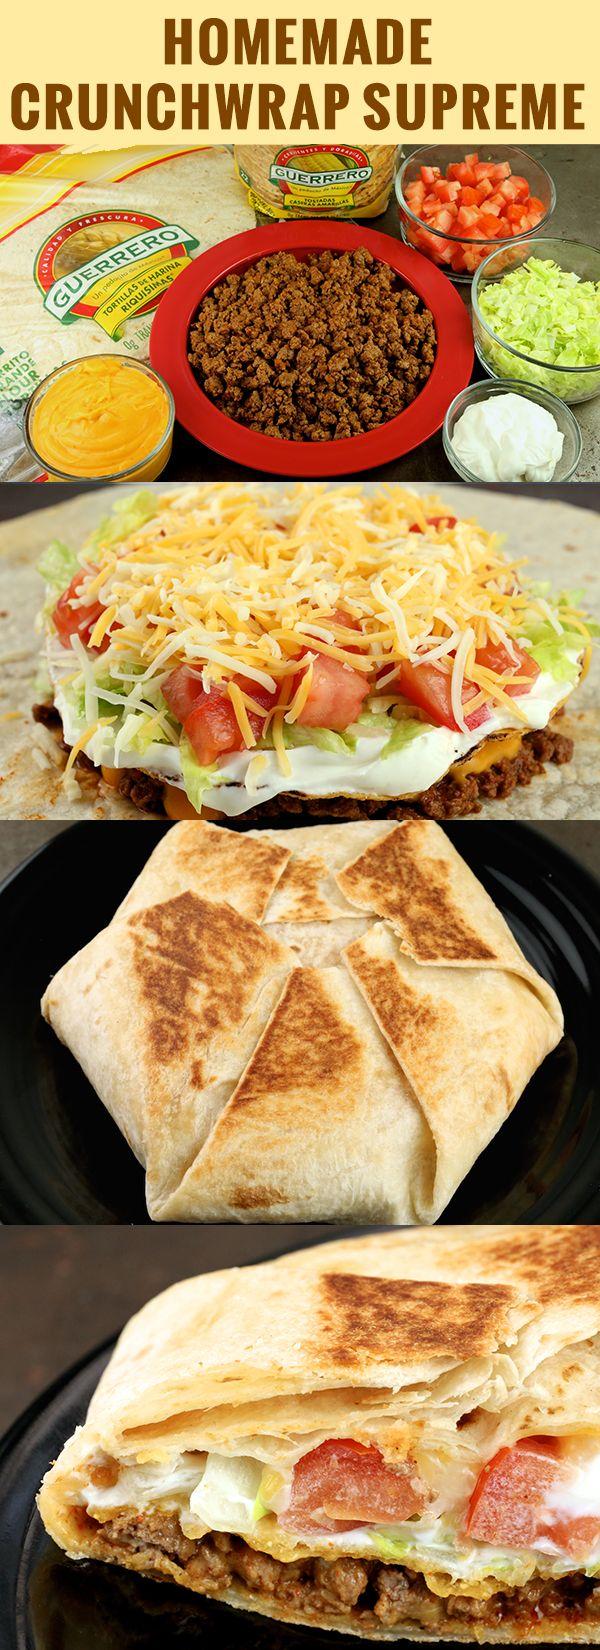 Homemade Crunchwrap Supreme Recipe | Crunchwrap Recipe #mexicandishes